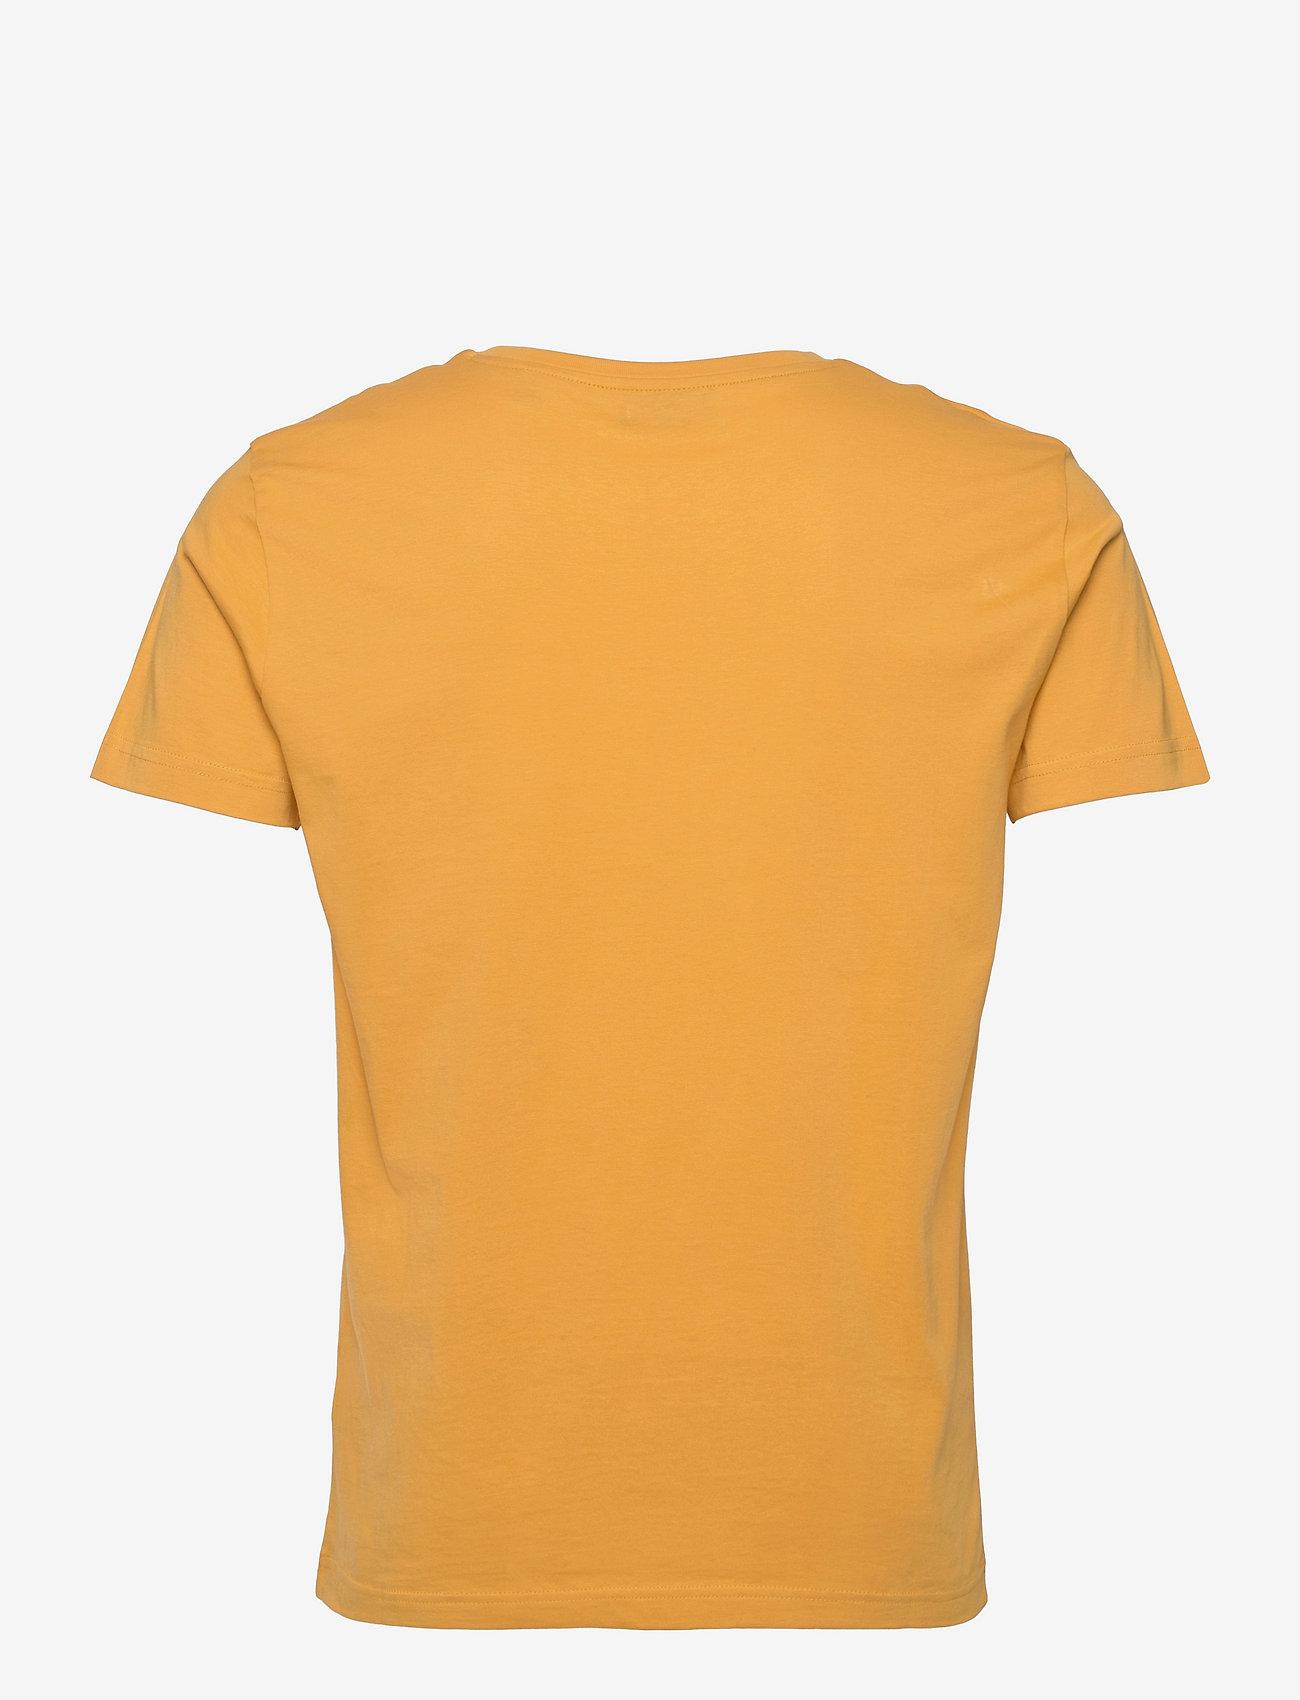 GANT - MD. FALL SS T-SHIRT - short-sleeved t-shirts - ivy gold - 1